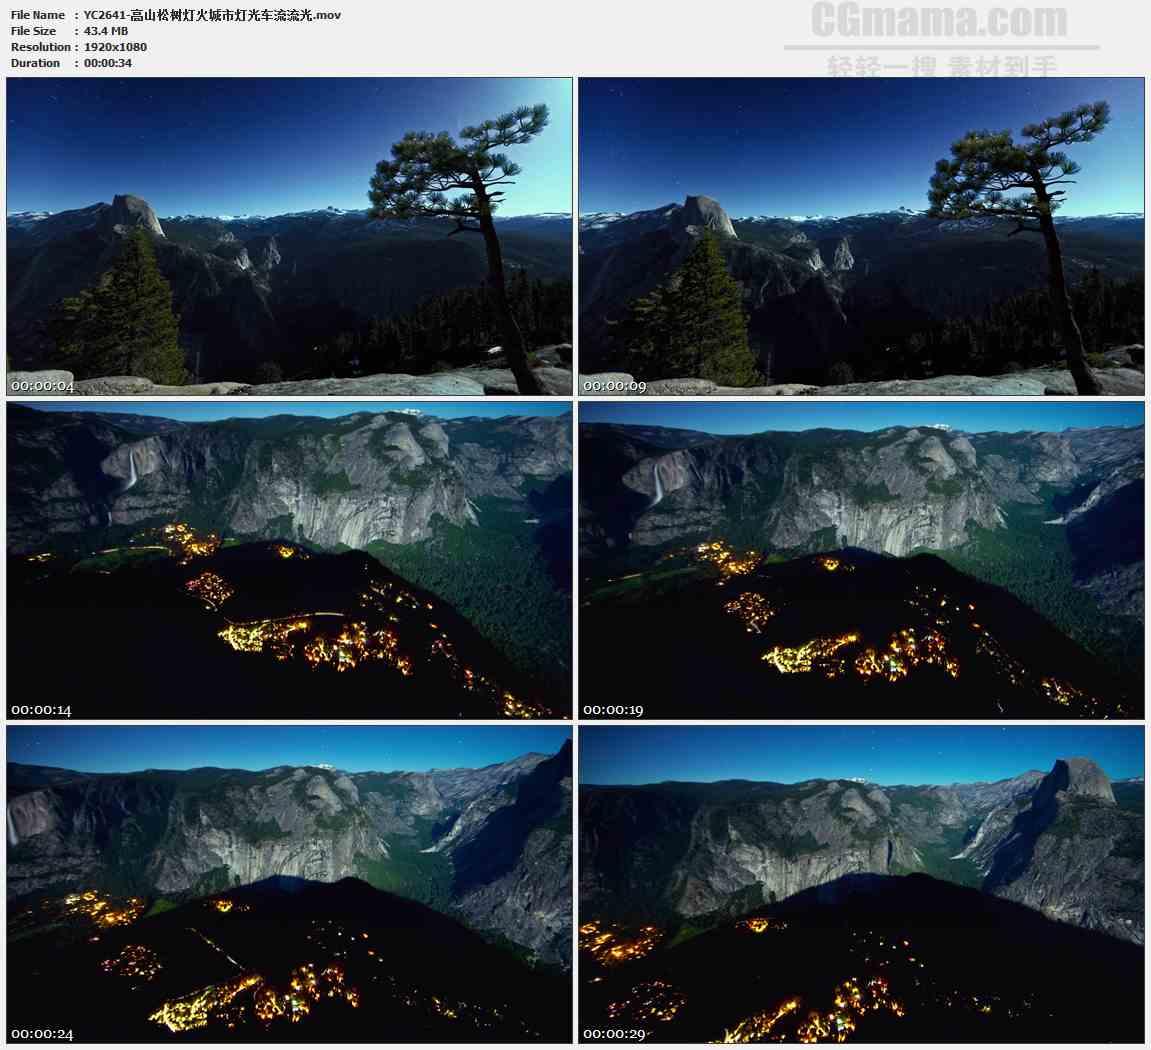 YC2641-高山松树灯火城市灯光车流流光高清实拍视频素材